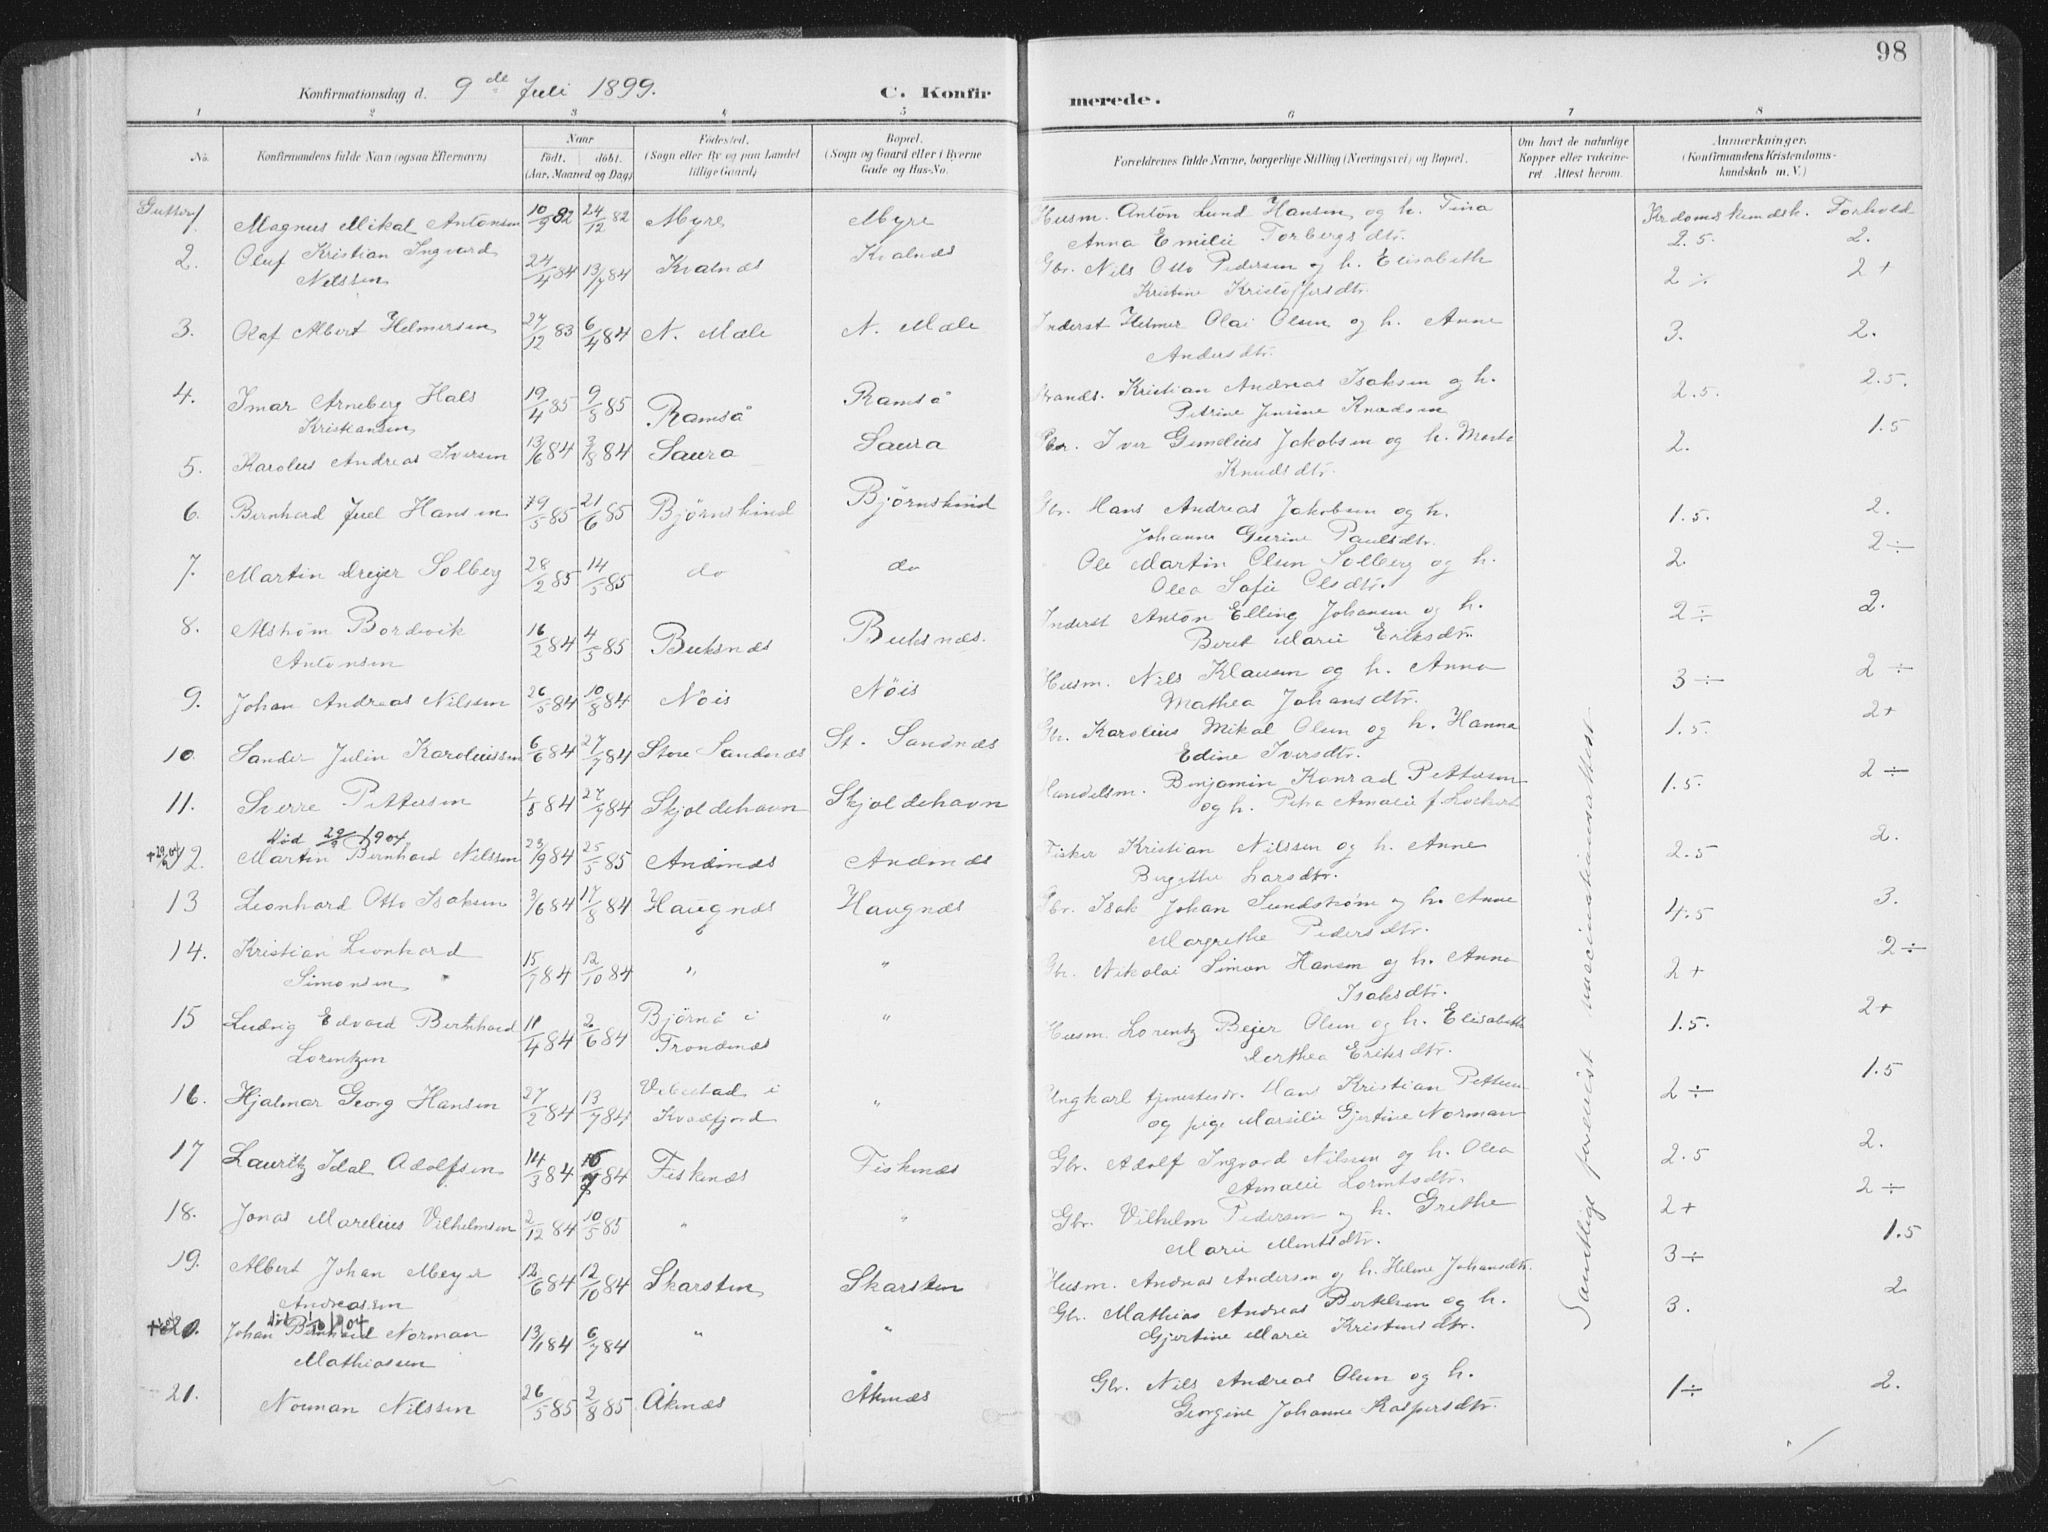 SAT, Ministerialprotokoller, klokkerbøker og fødselsregistre - Nordland, 897/L1400: Ministerialbok nr. 897A07, 1897-1908, s. 98